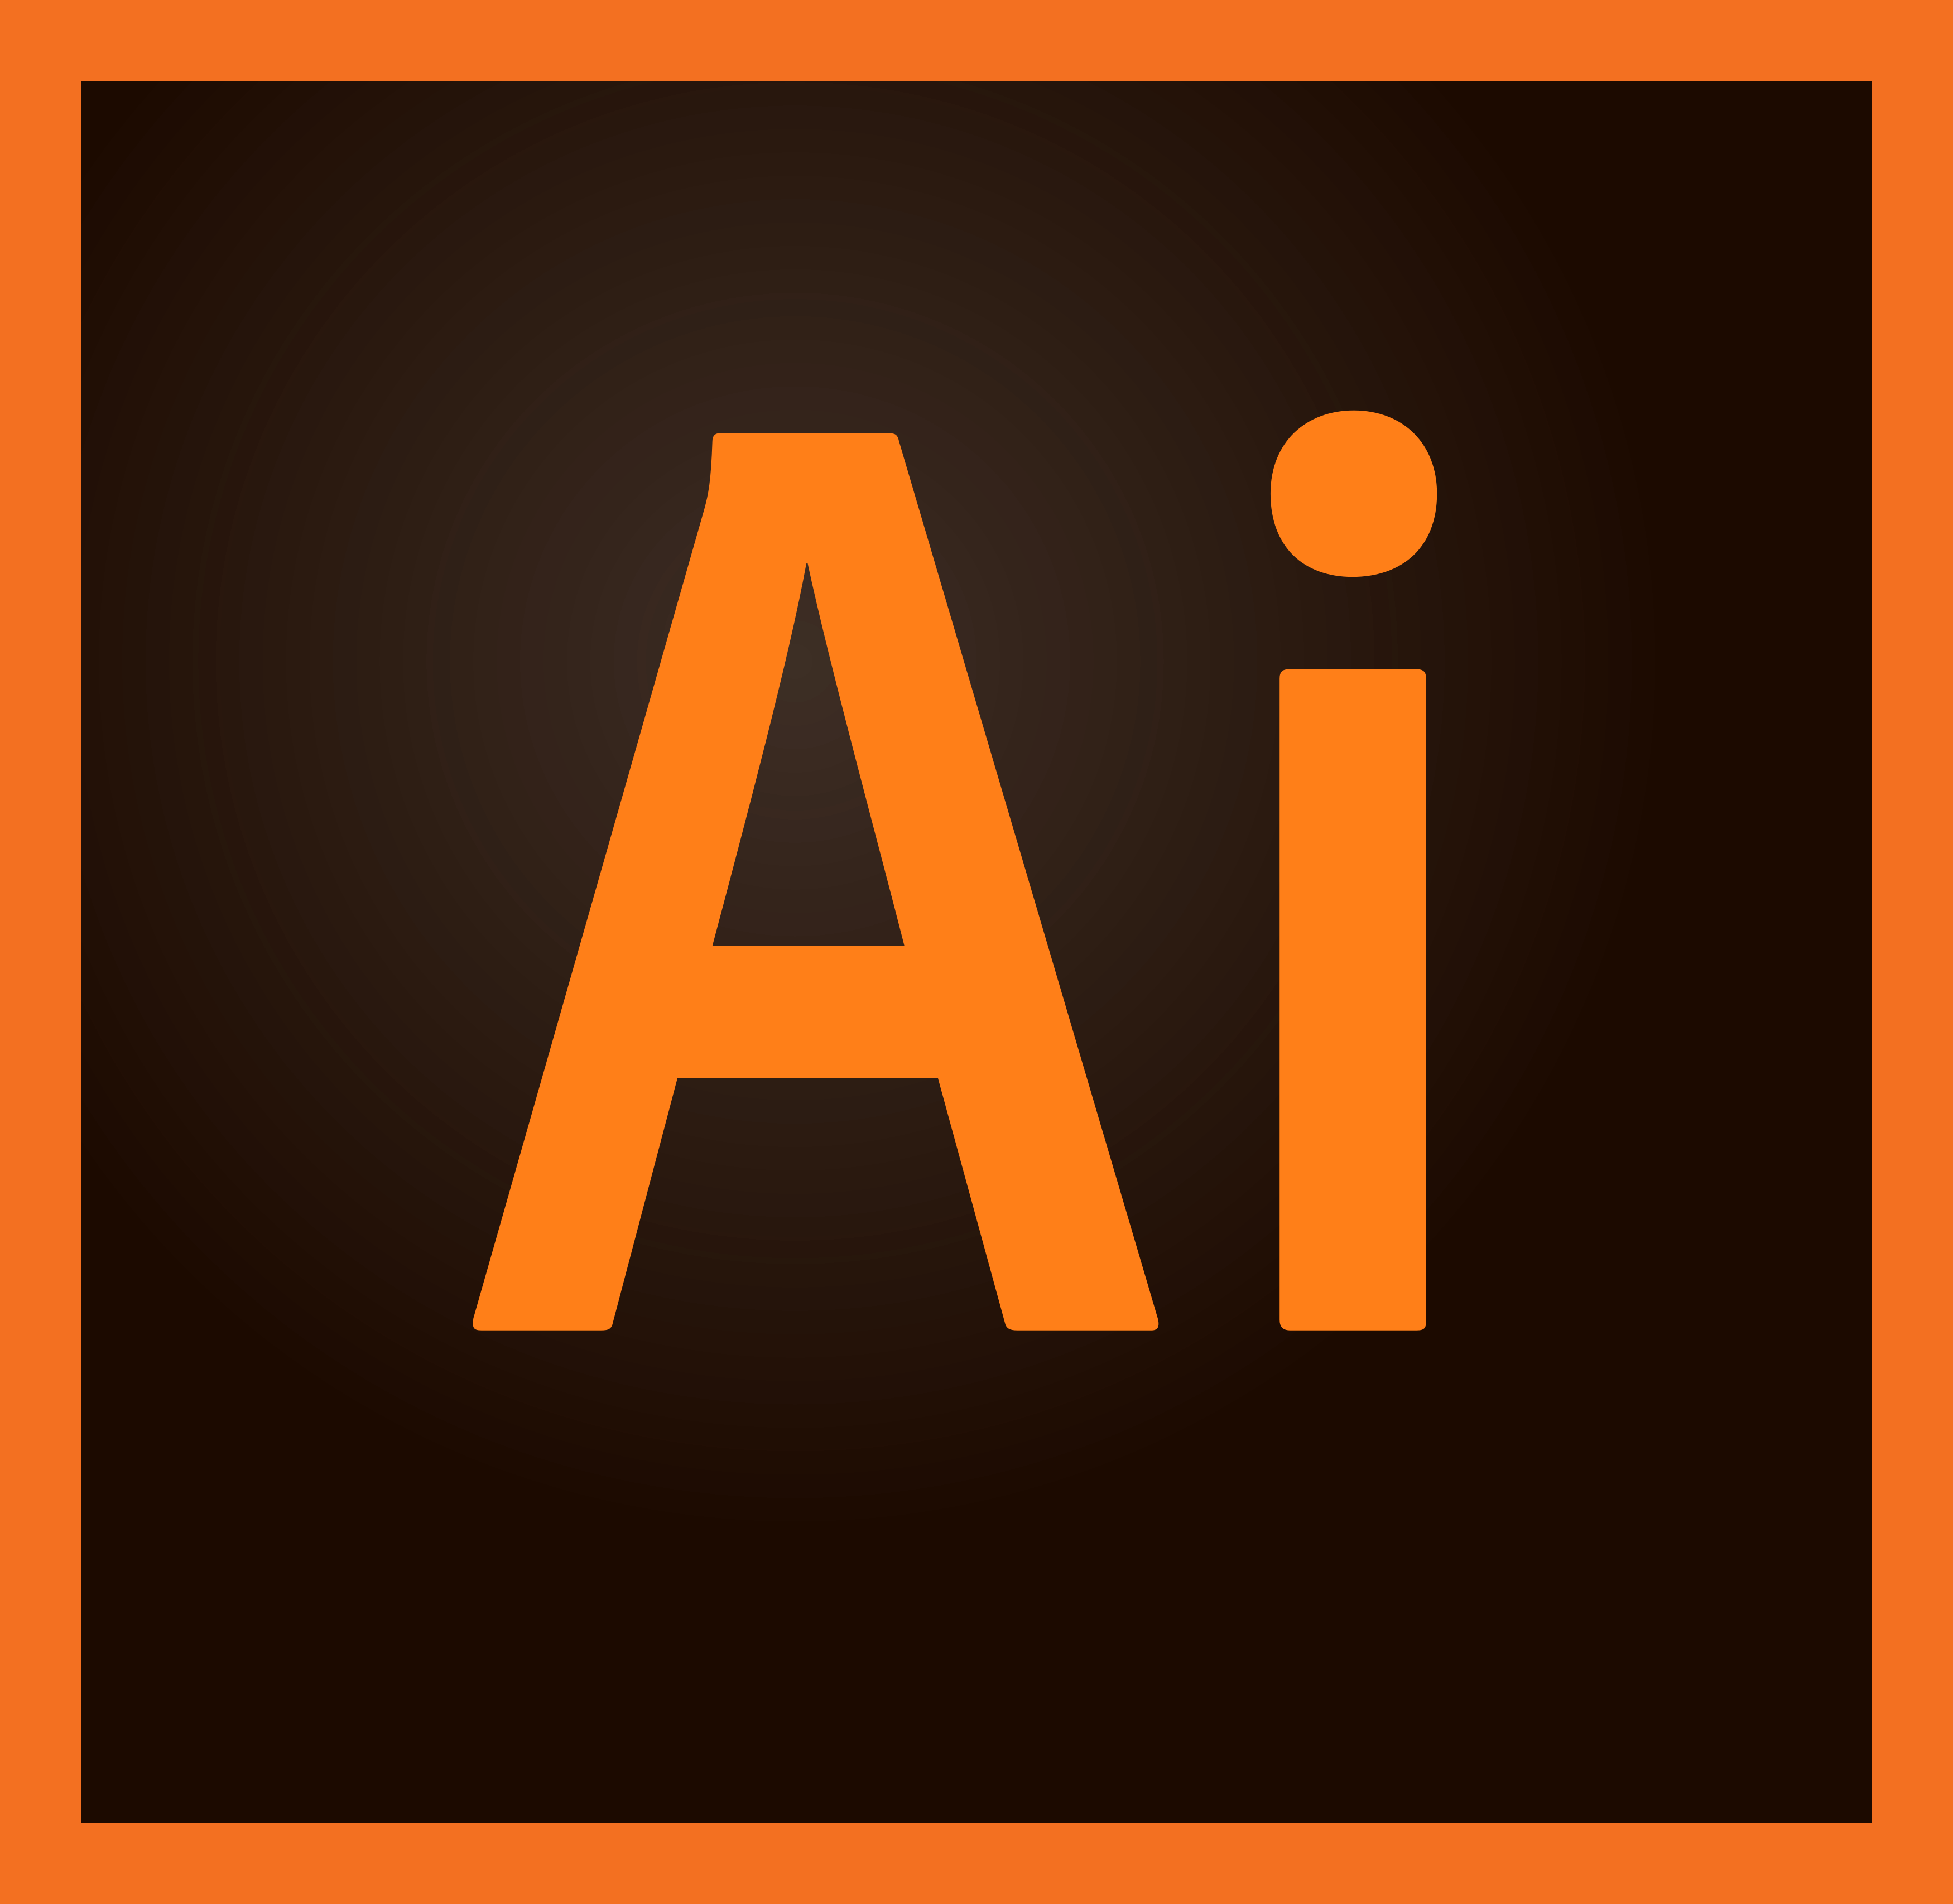 Adobe Illustrator Ai Logo.